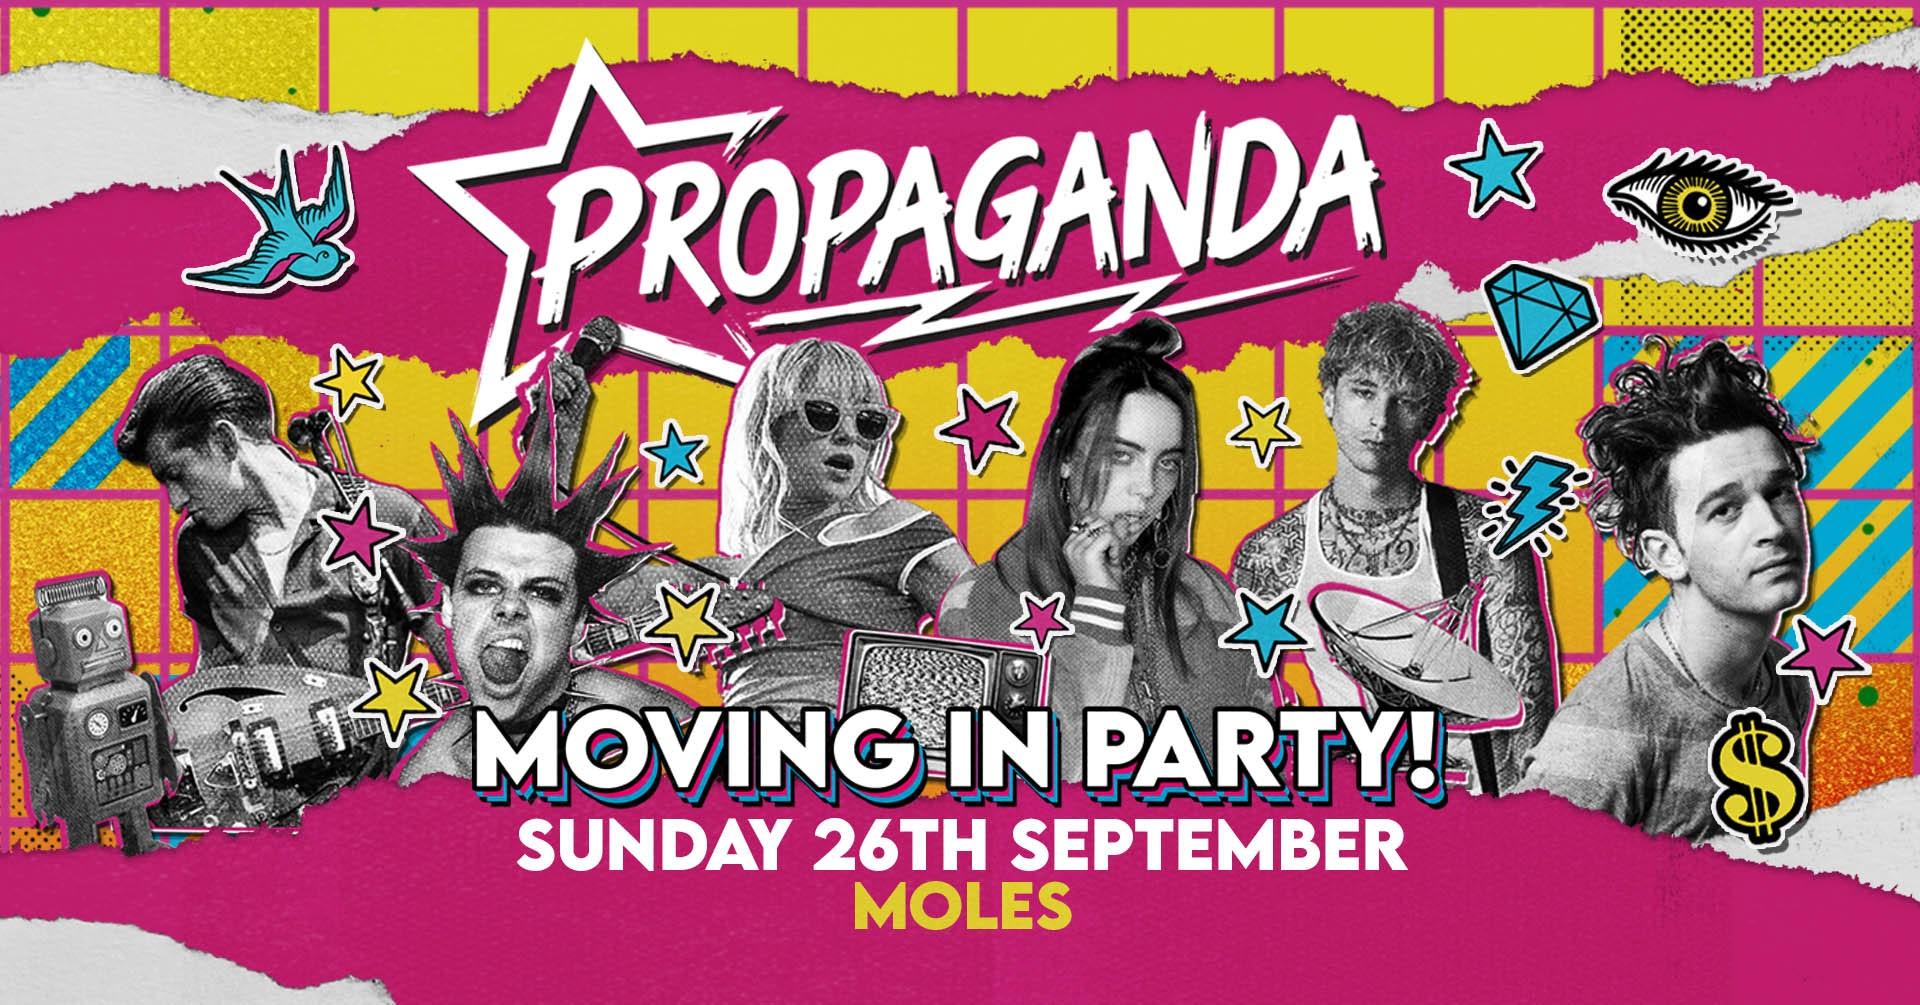 Propaganda Bath – Moving In Party!